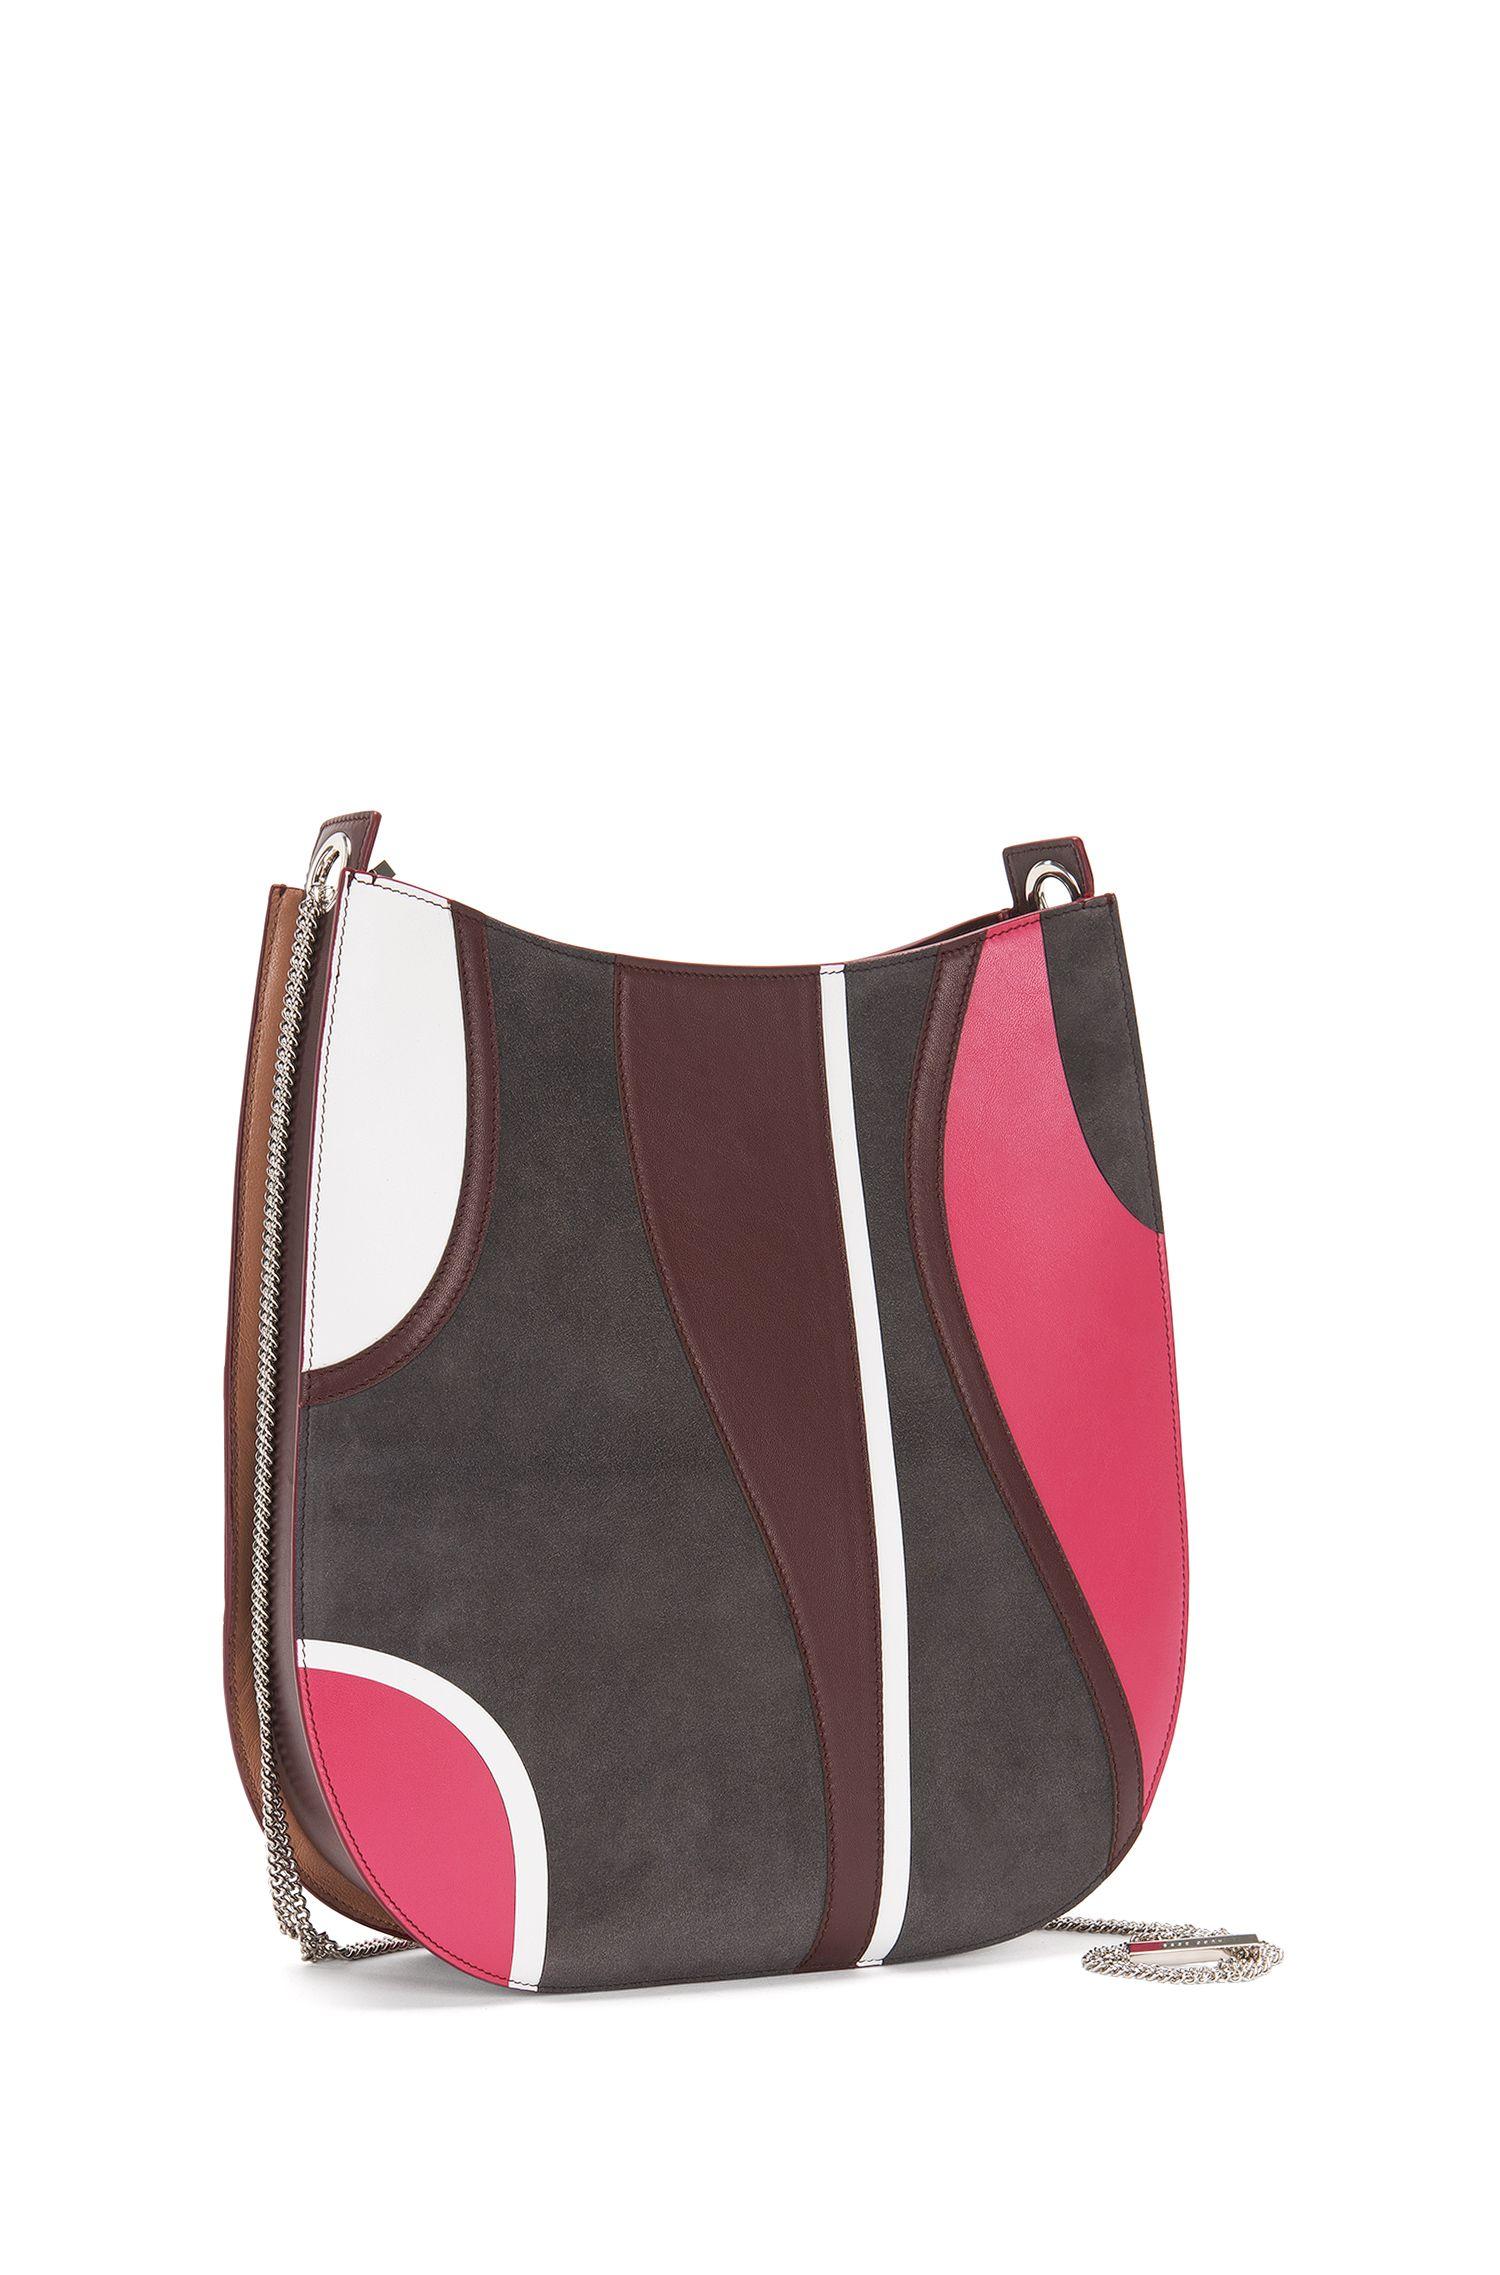 'BOSS Bespoke H S P' | Italian Leather Patchwork Hobo Bag, Detachable Chain Strap